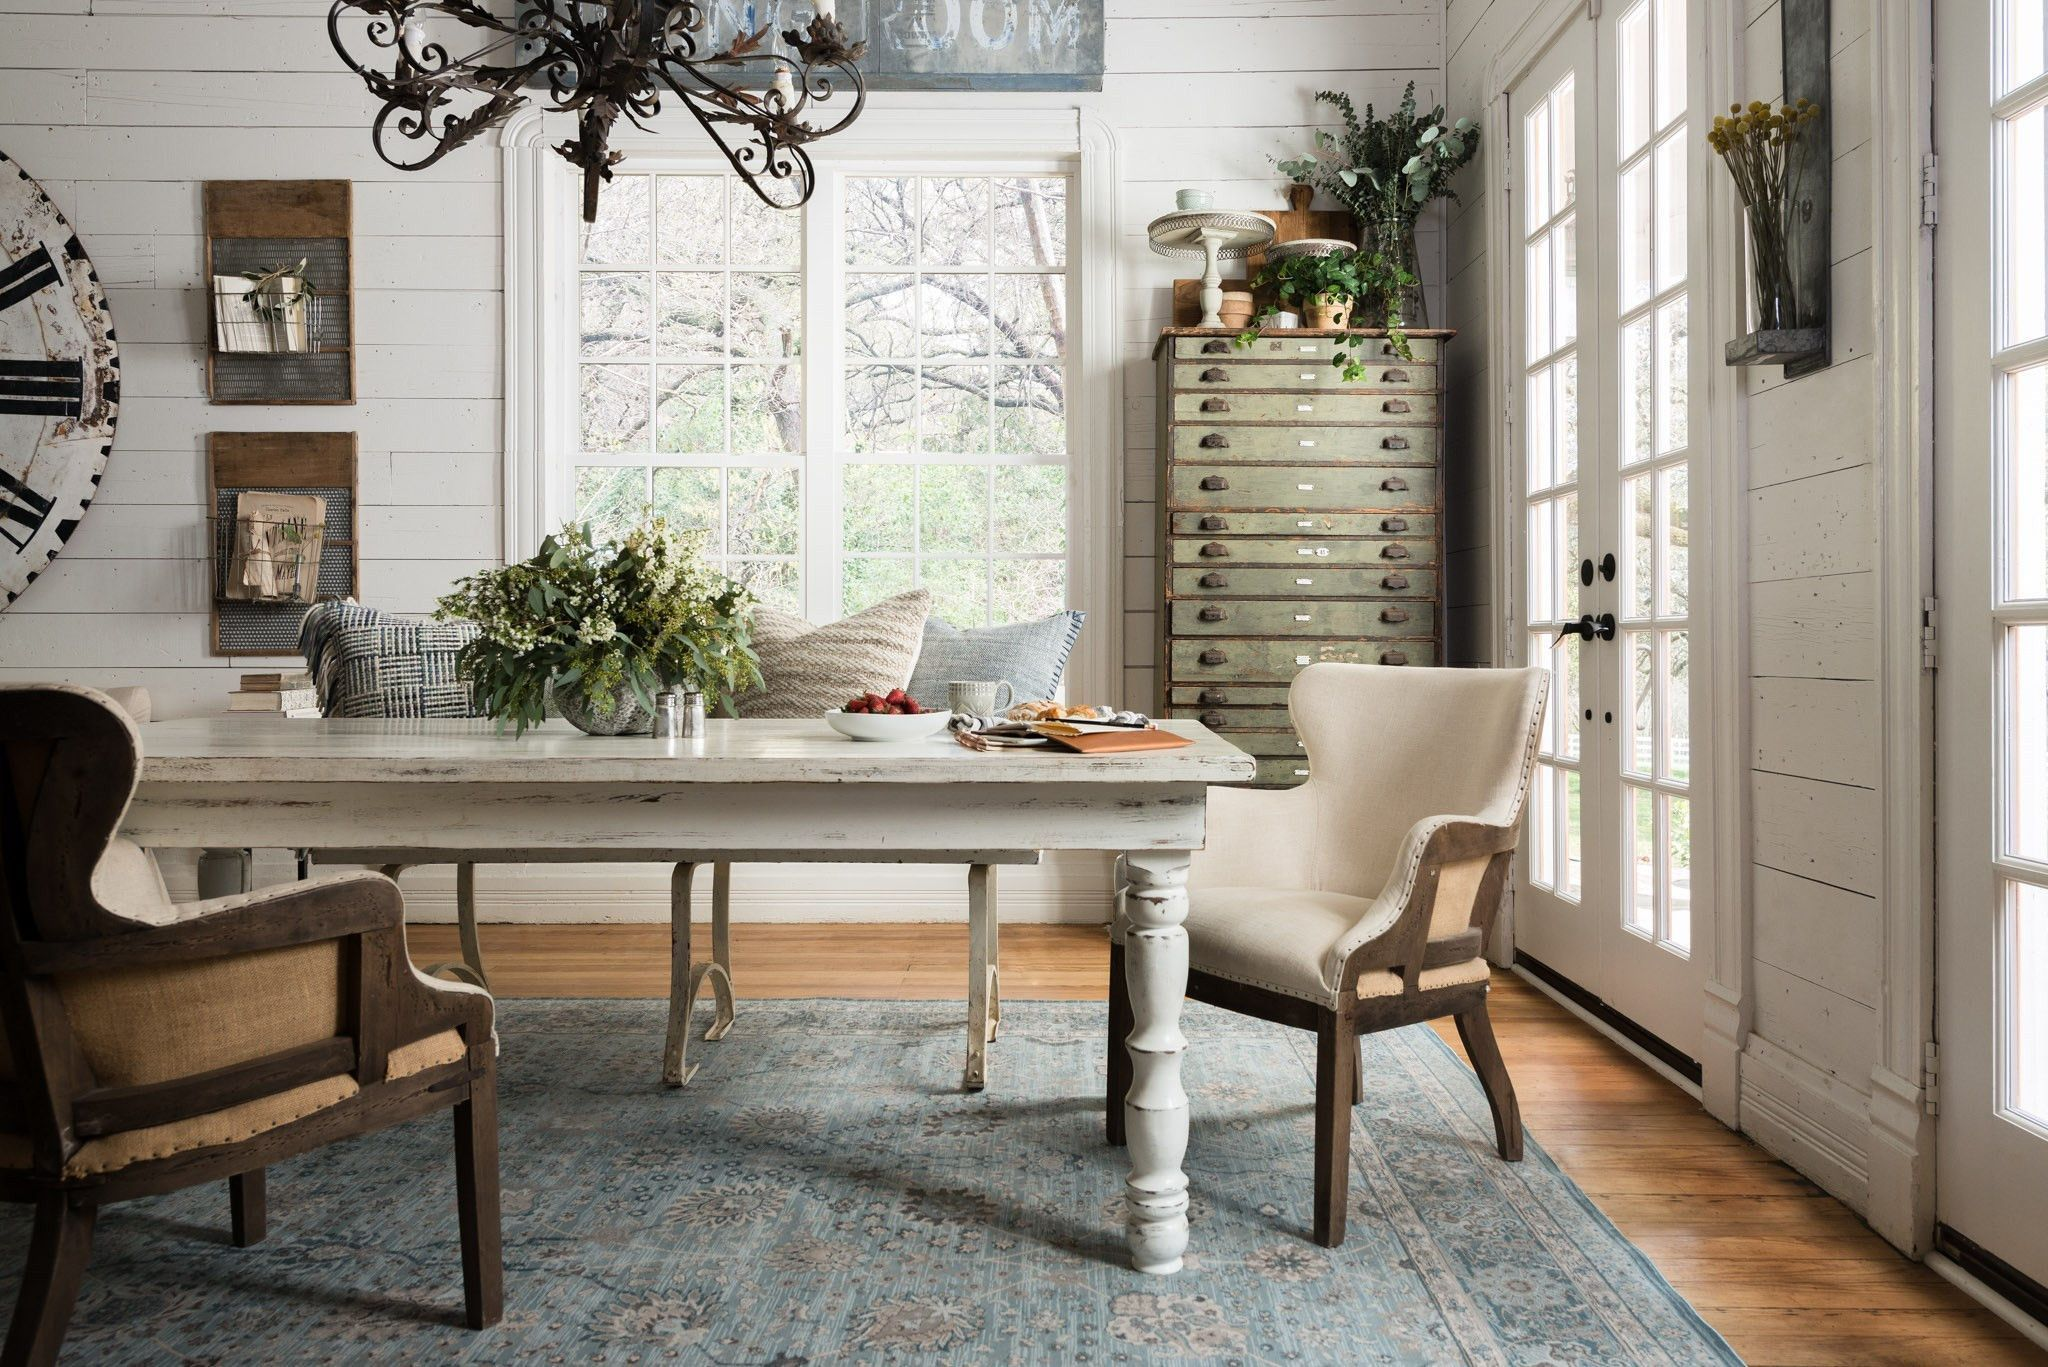 Modern And Vintage Interior Design